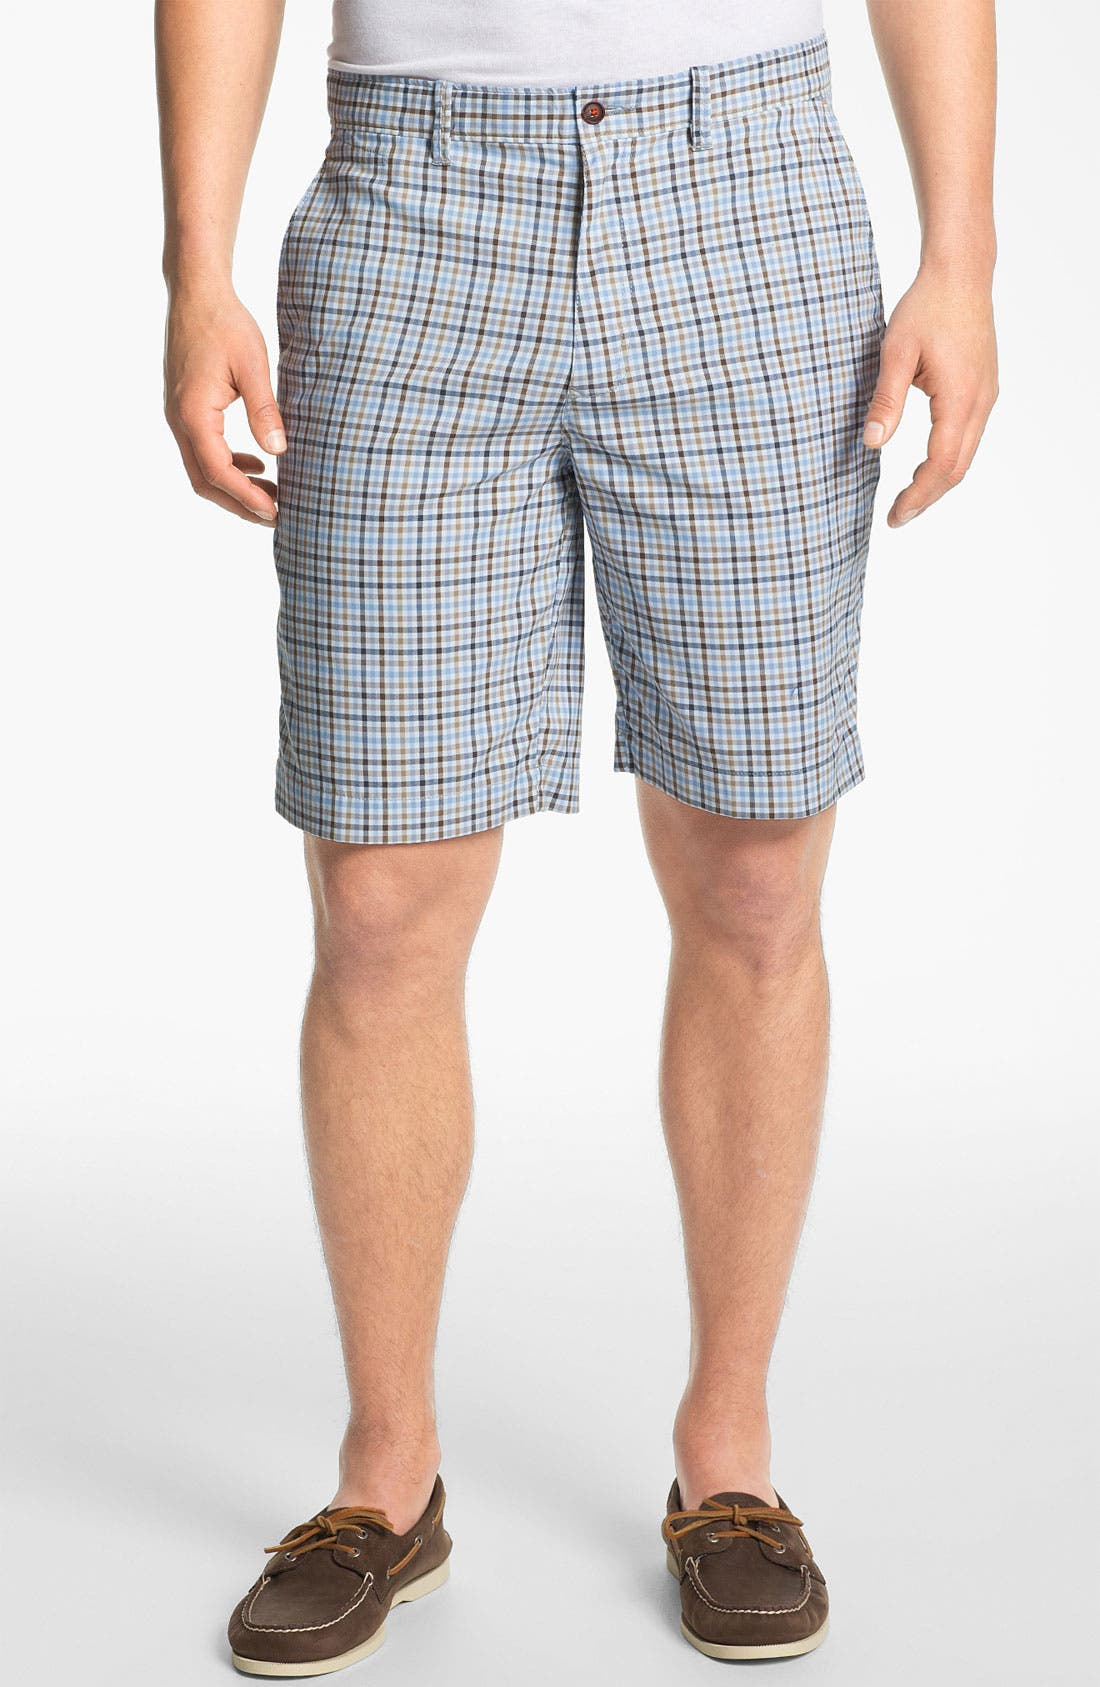 Alternate Image 1 Selected - Tommy Bahama 'Golf Shores' Shorts